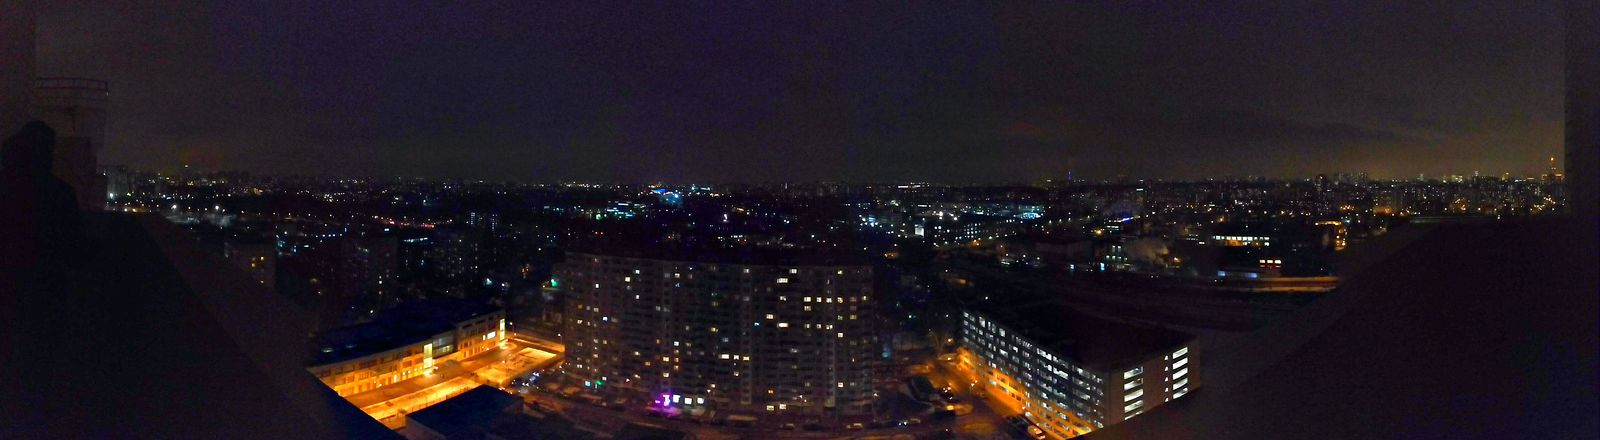 Panoramic Photography Panorama Camera  Panorama